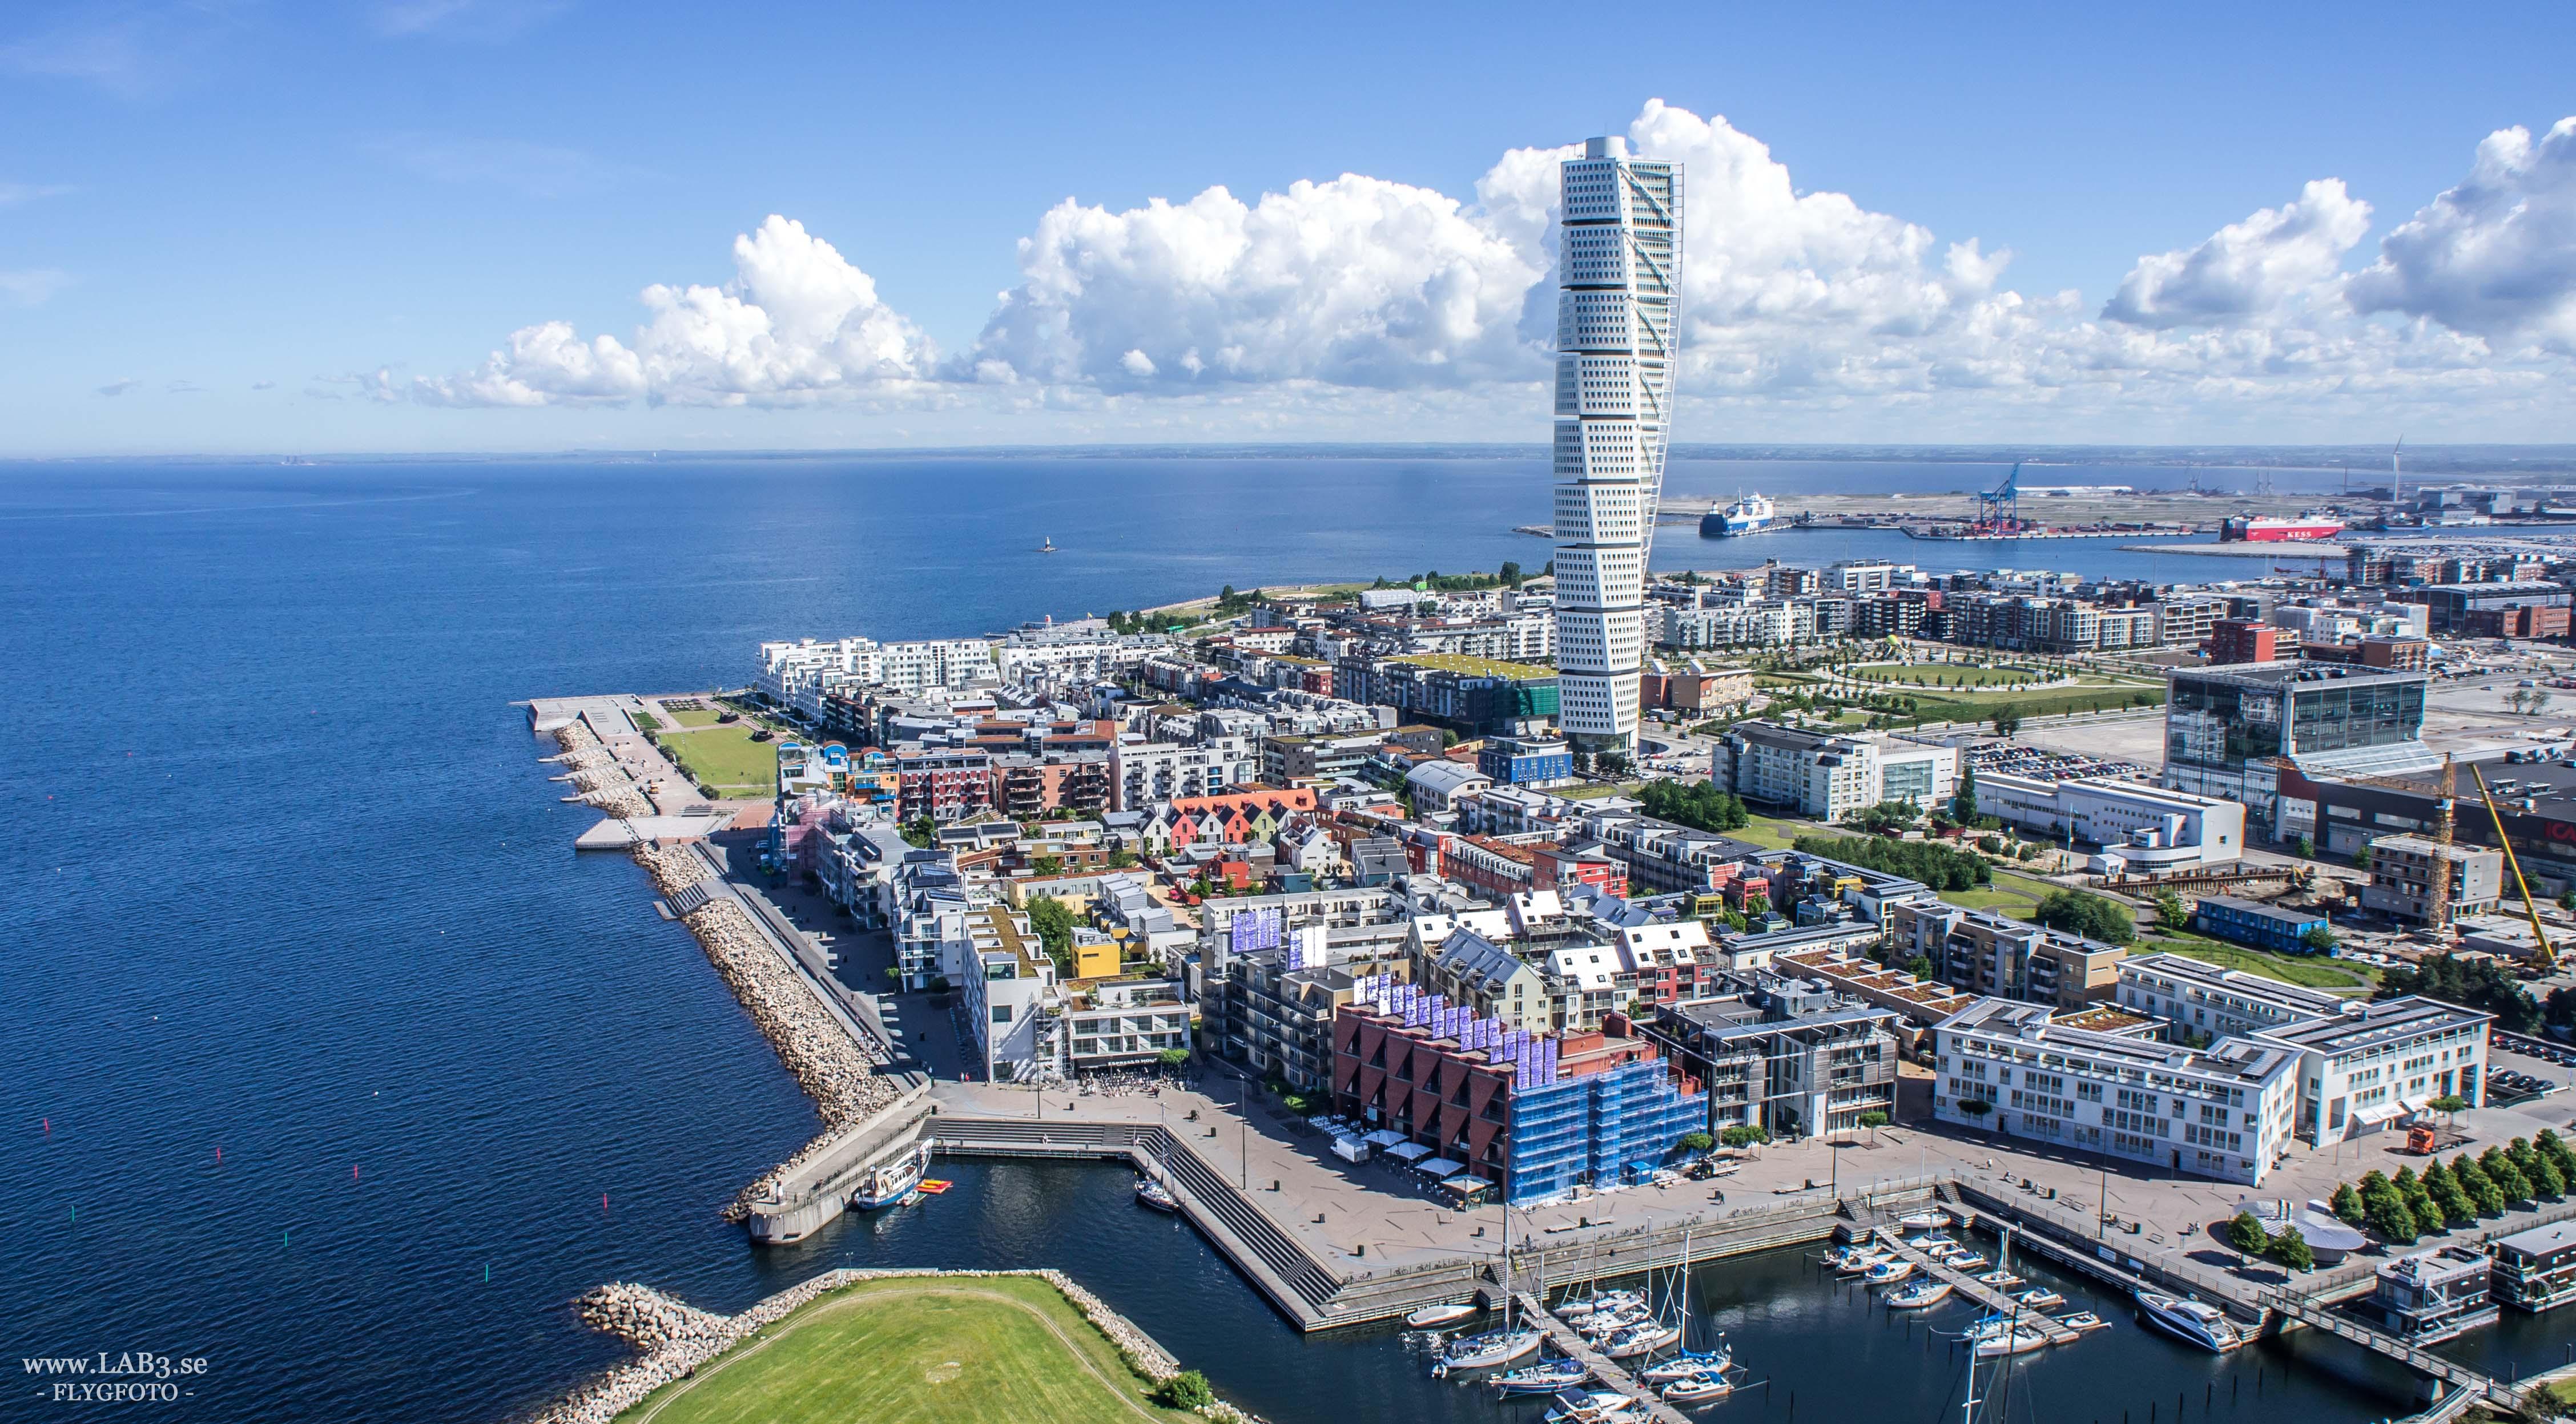 Vue aérienne de Malmö